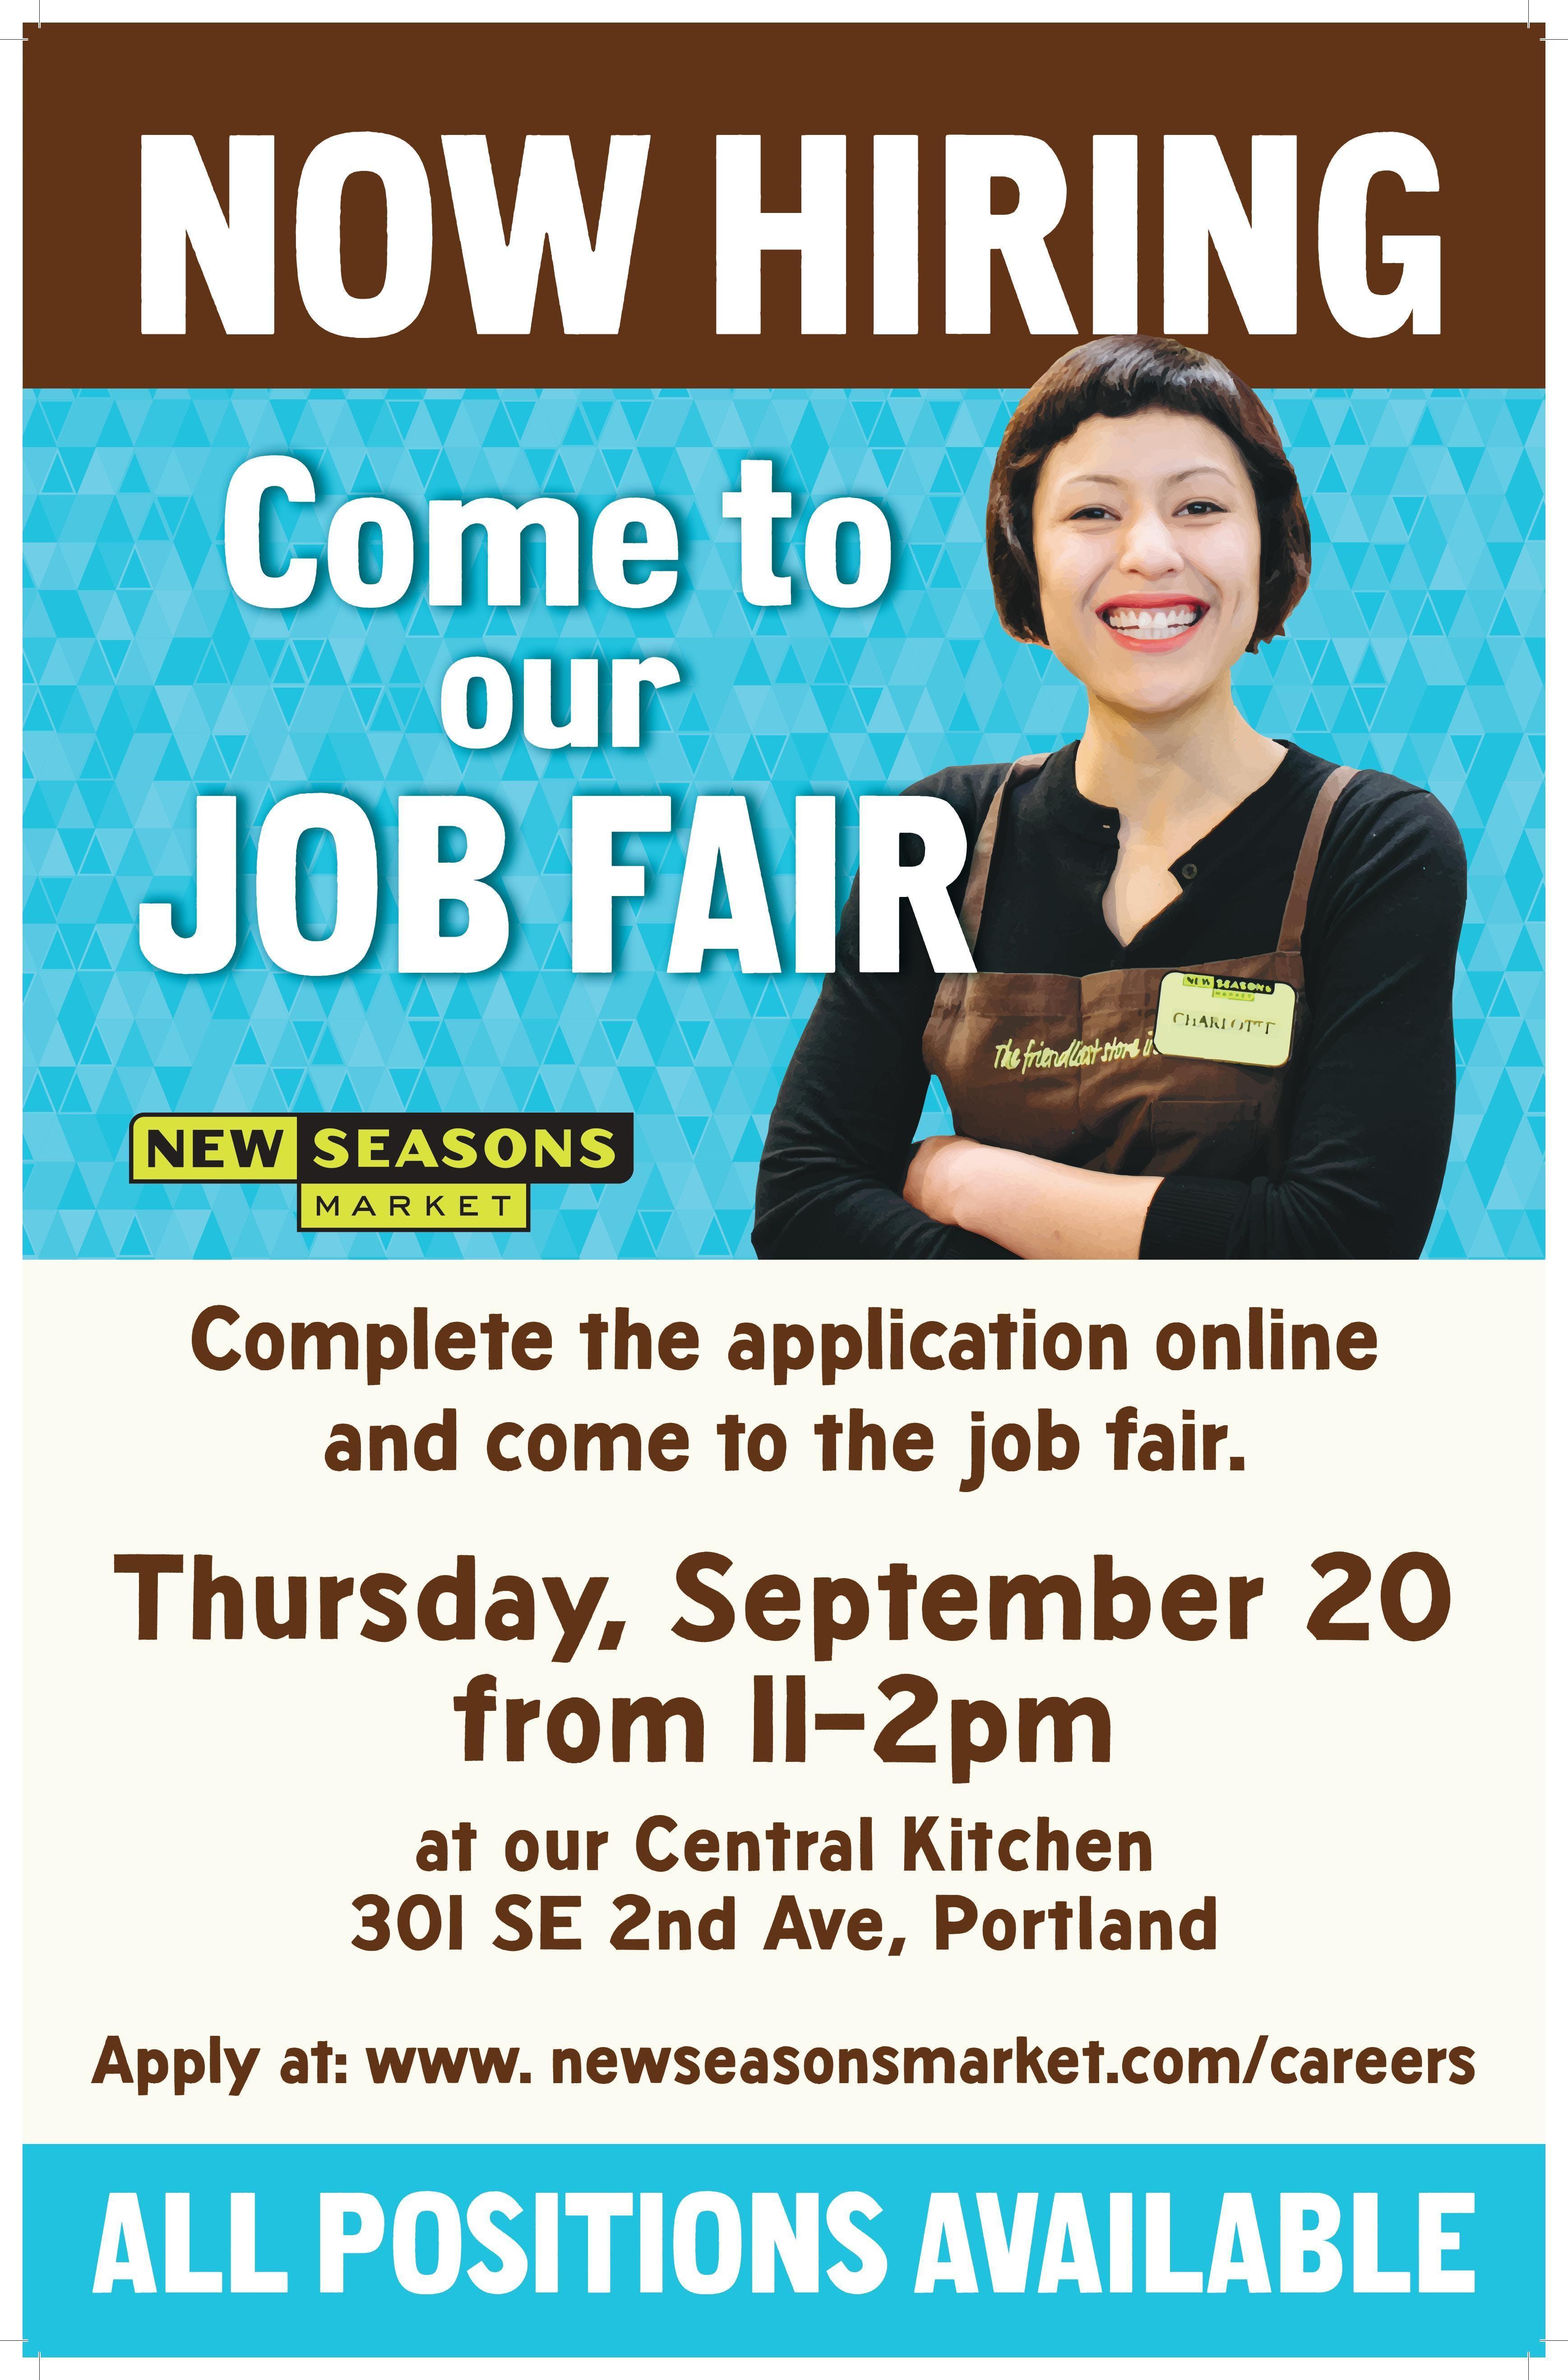 New Seasons Market- Central Kitchen Job Fair